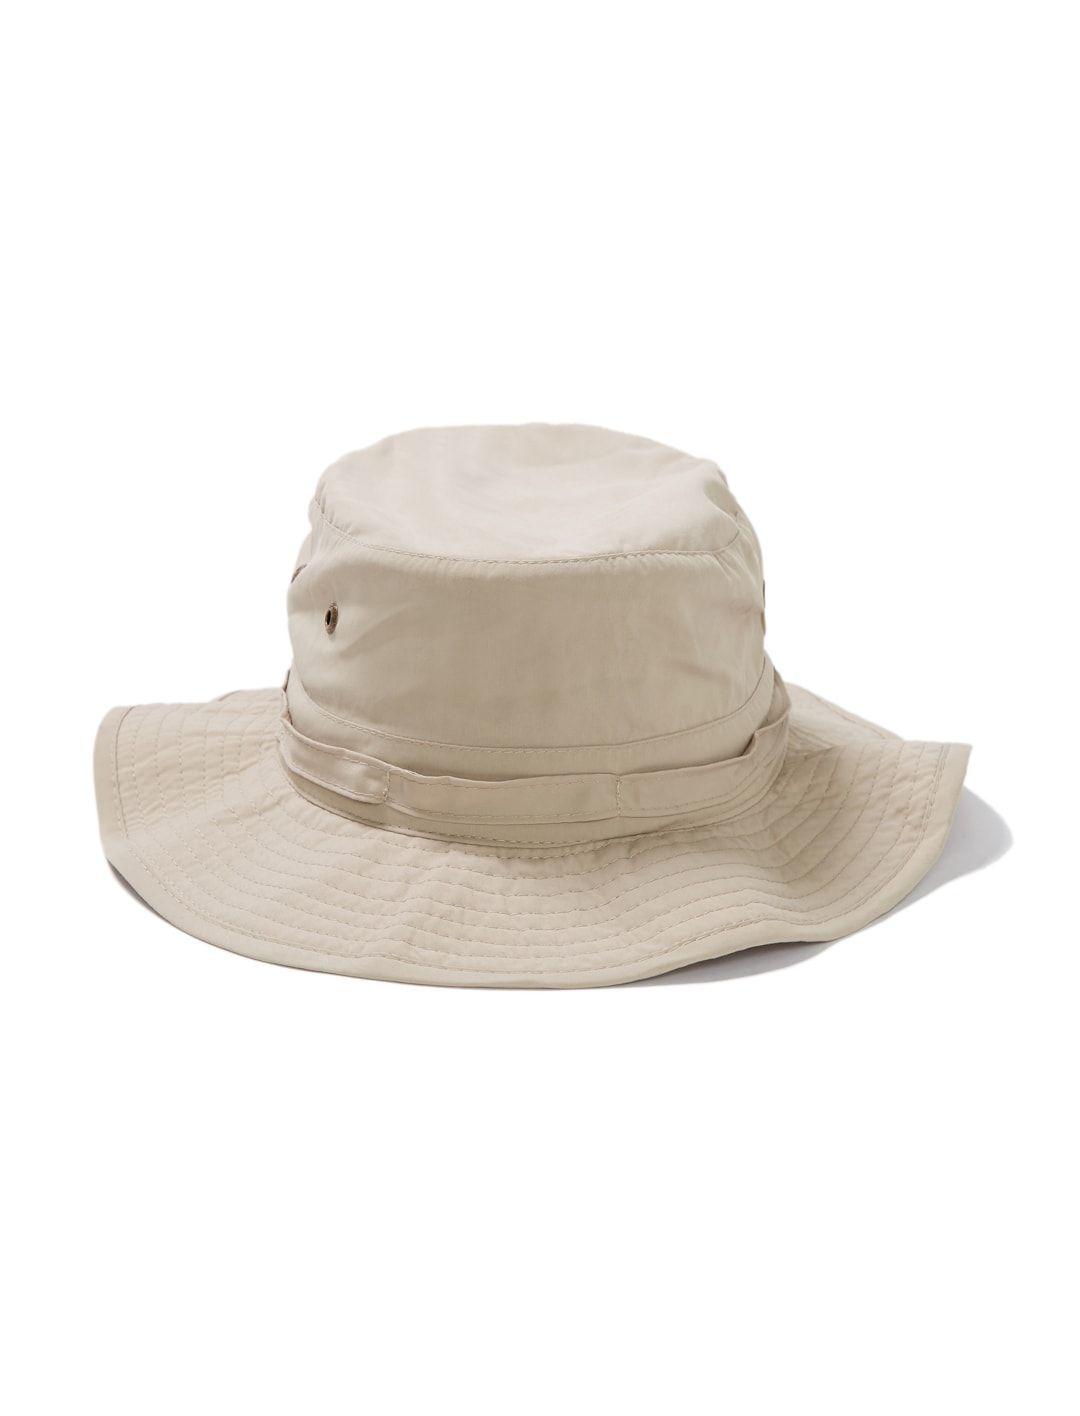 b939eeba0ea25 Stetson Men s No Fly Zone Mesh Bucket Hat STC200. Details